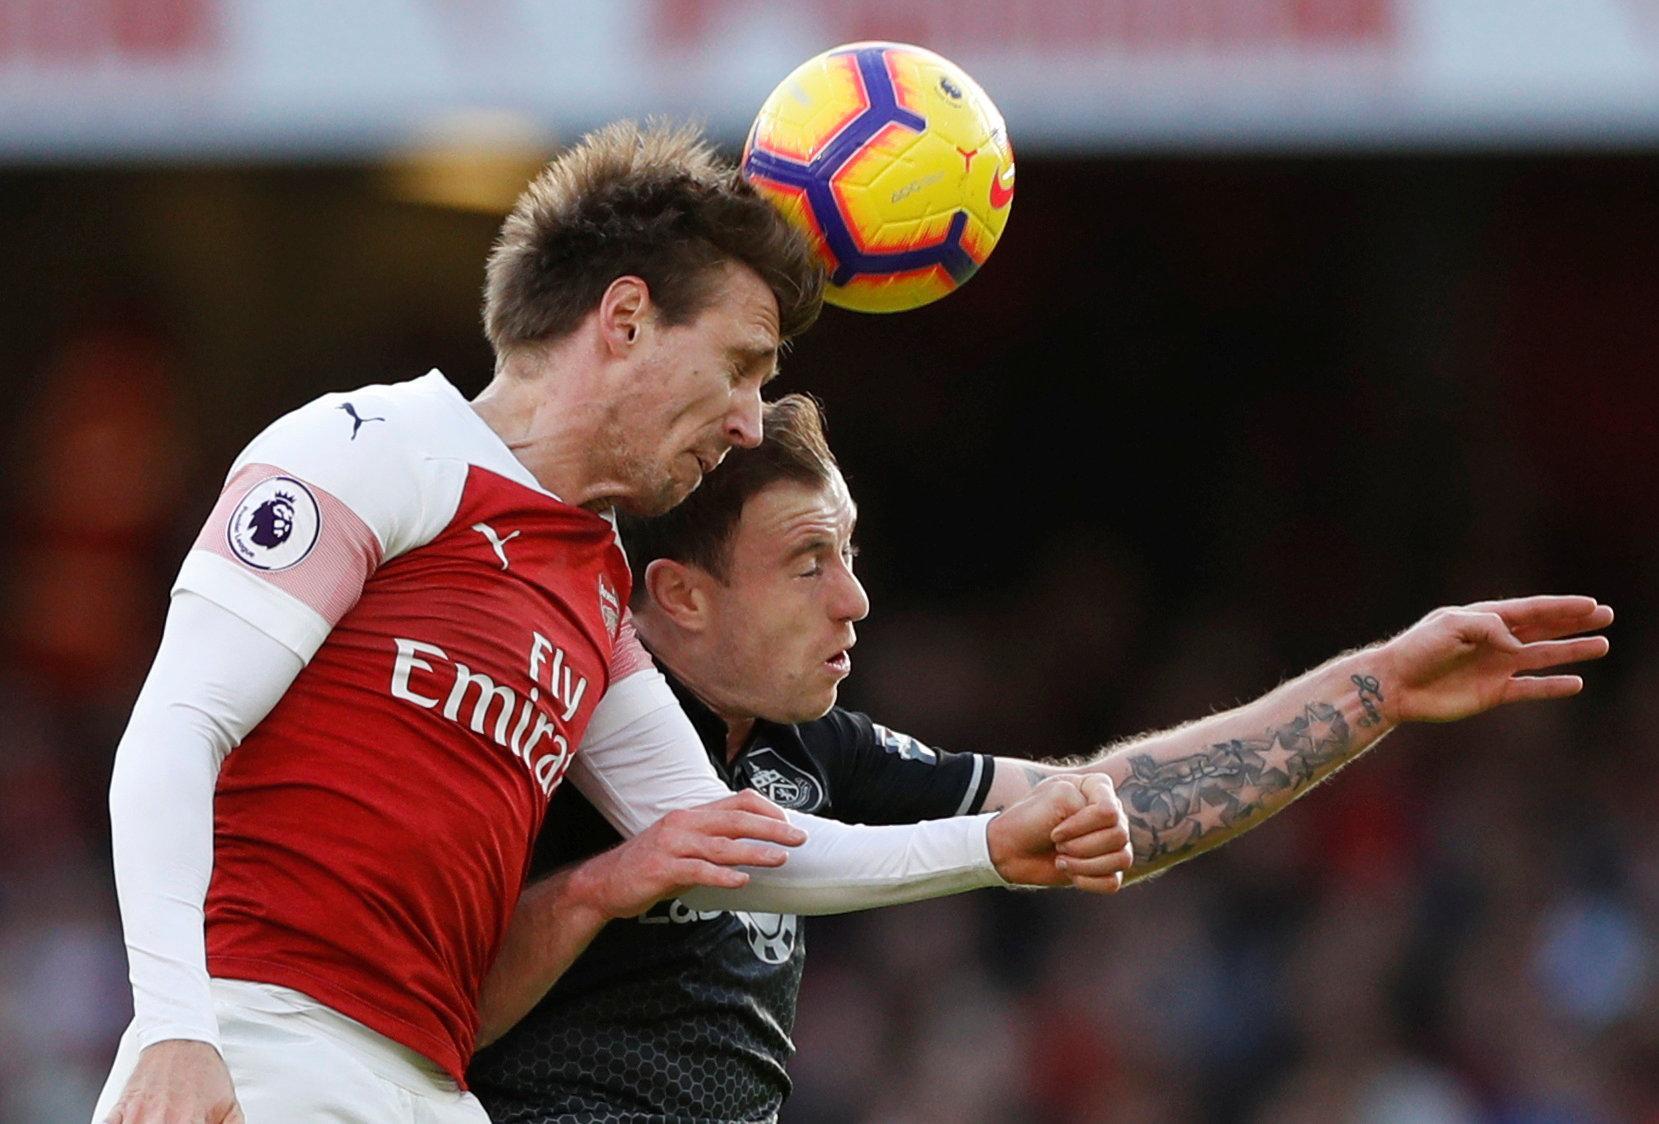 The knock to Nacho Monreal only furthers Arsenal's injury crisis